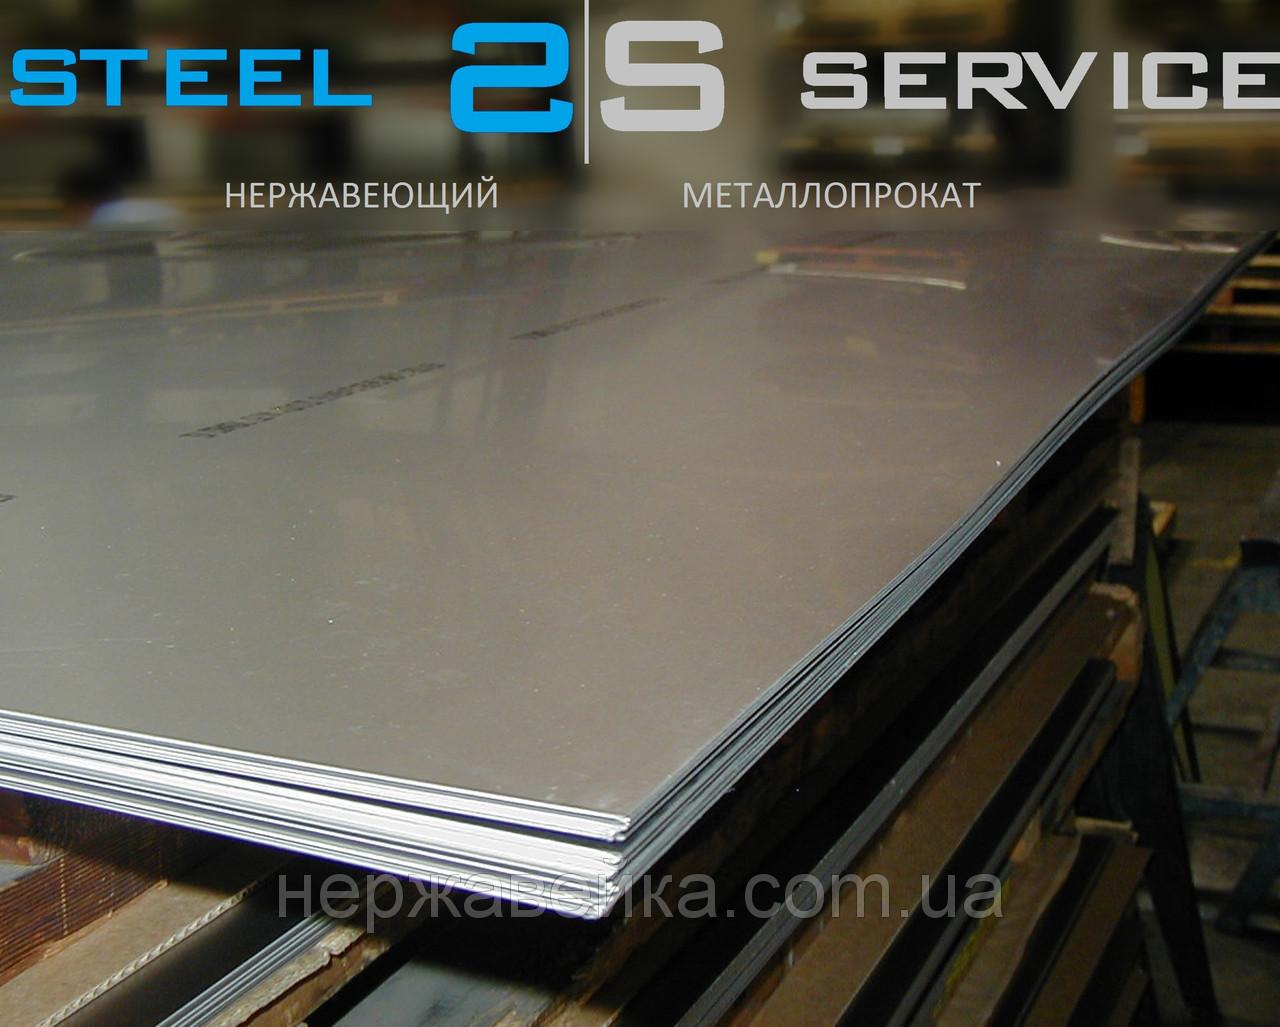 Нержавейка лист 12х1500х3000мм AISI 410S(08Х13) F1 - горячекатанный, технический